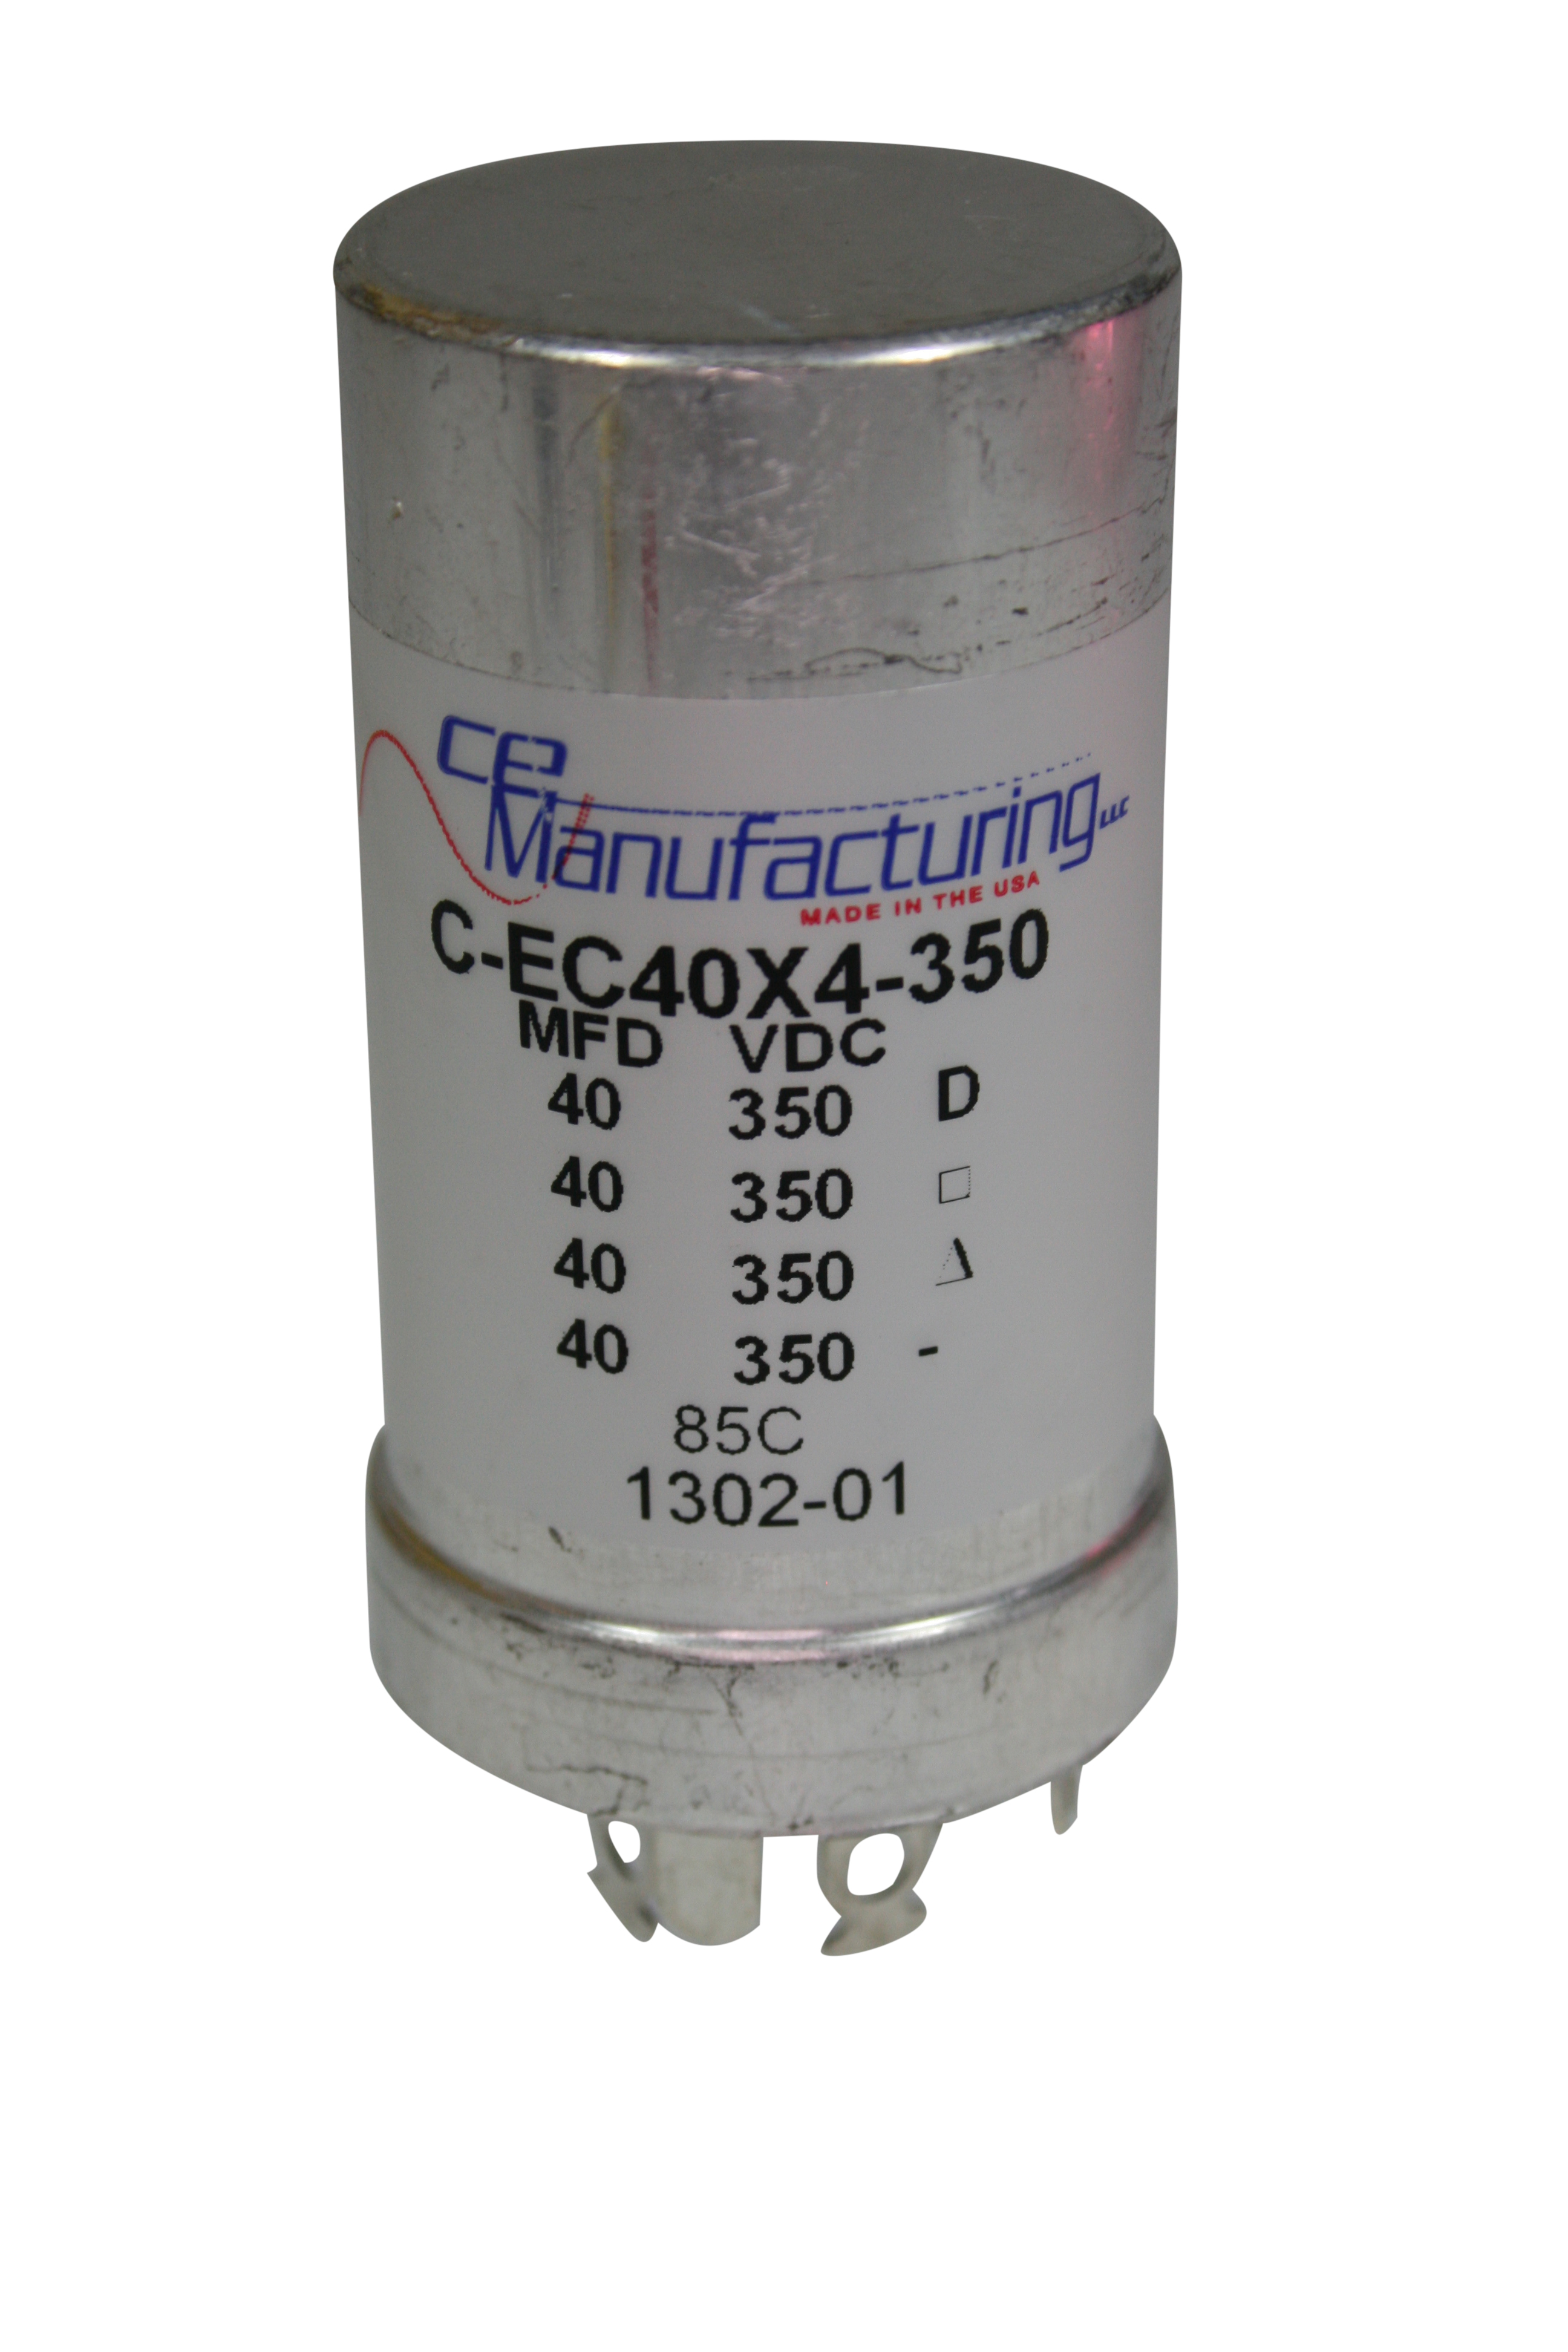 CE Mfg. 40x40x40x40uF, 350V